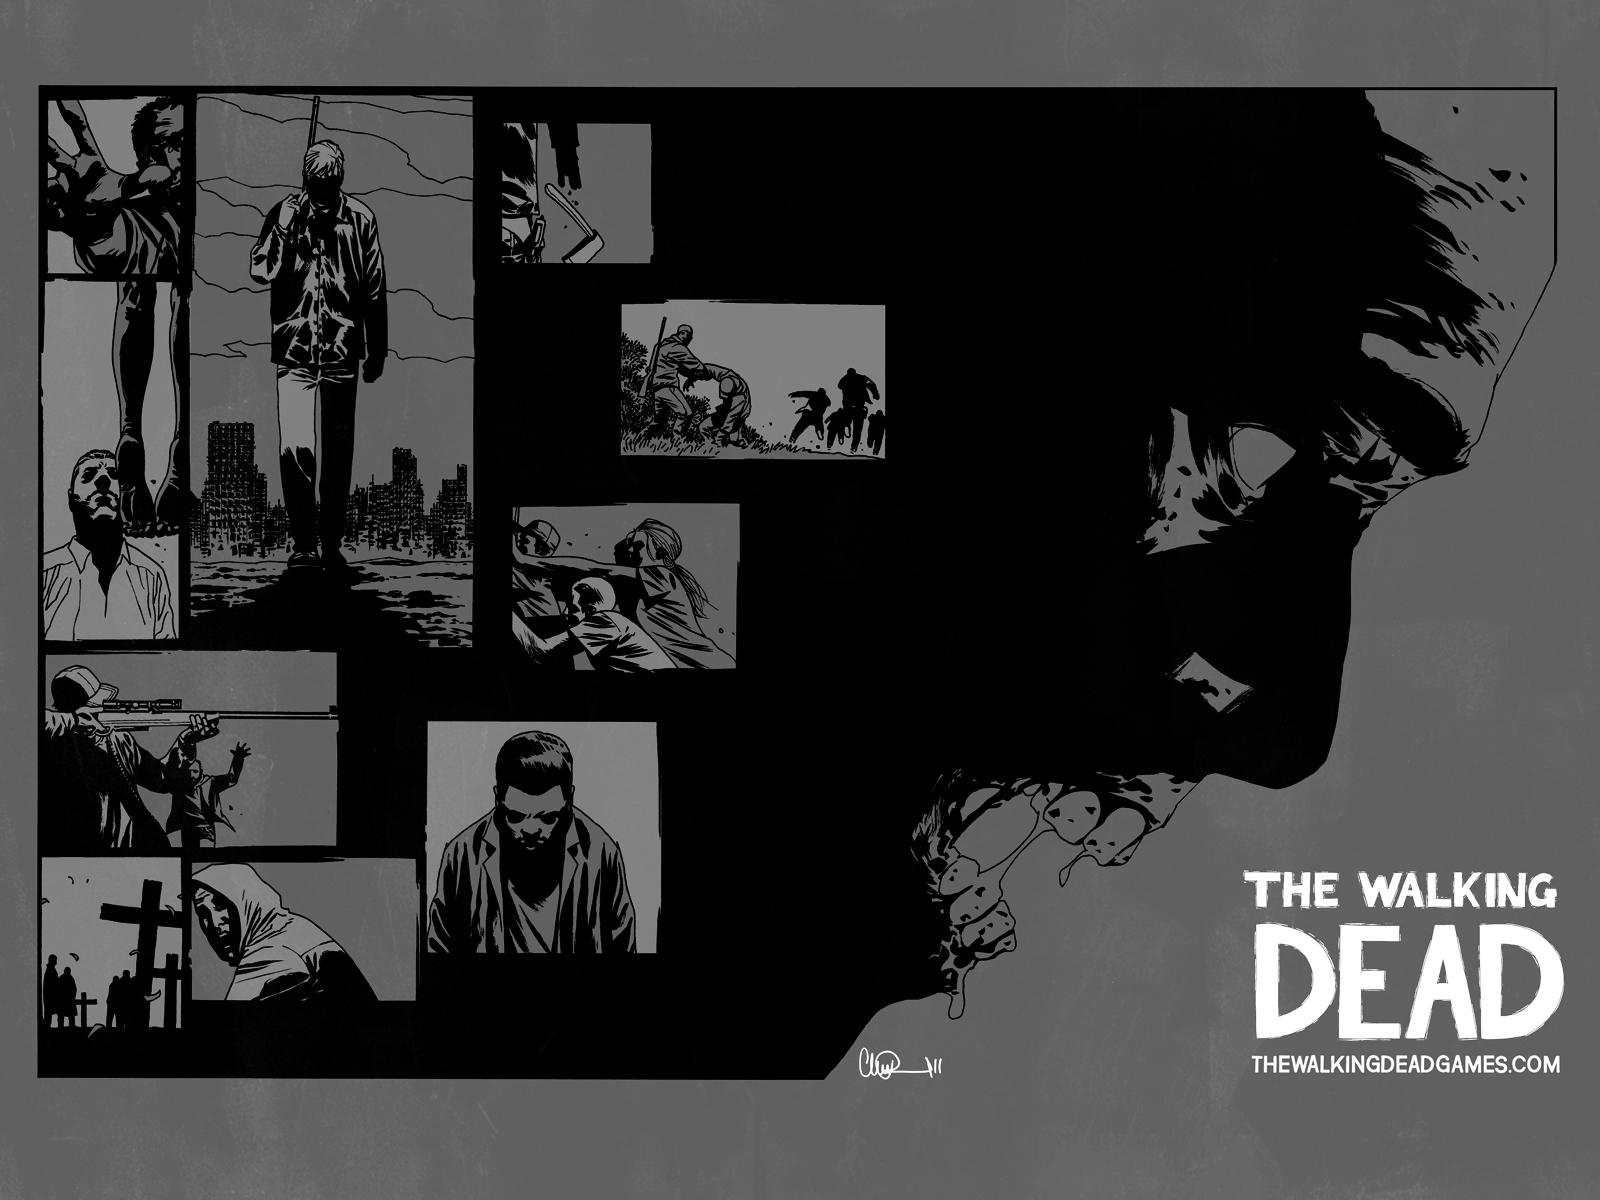 The Walking Dead Comic Character Wallpaper of The Walking Dead as